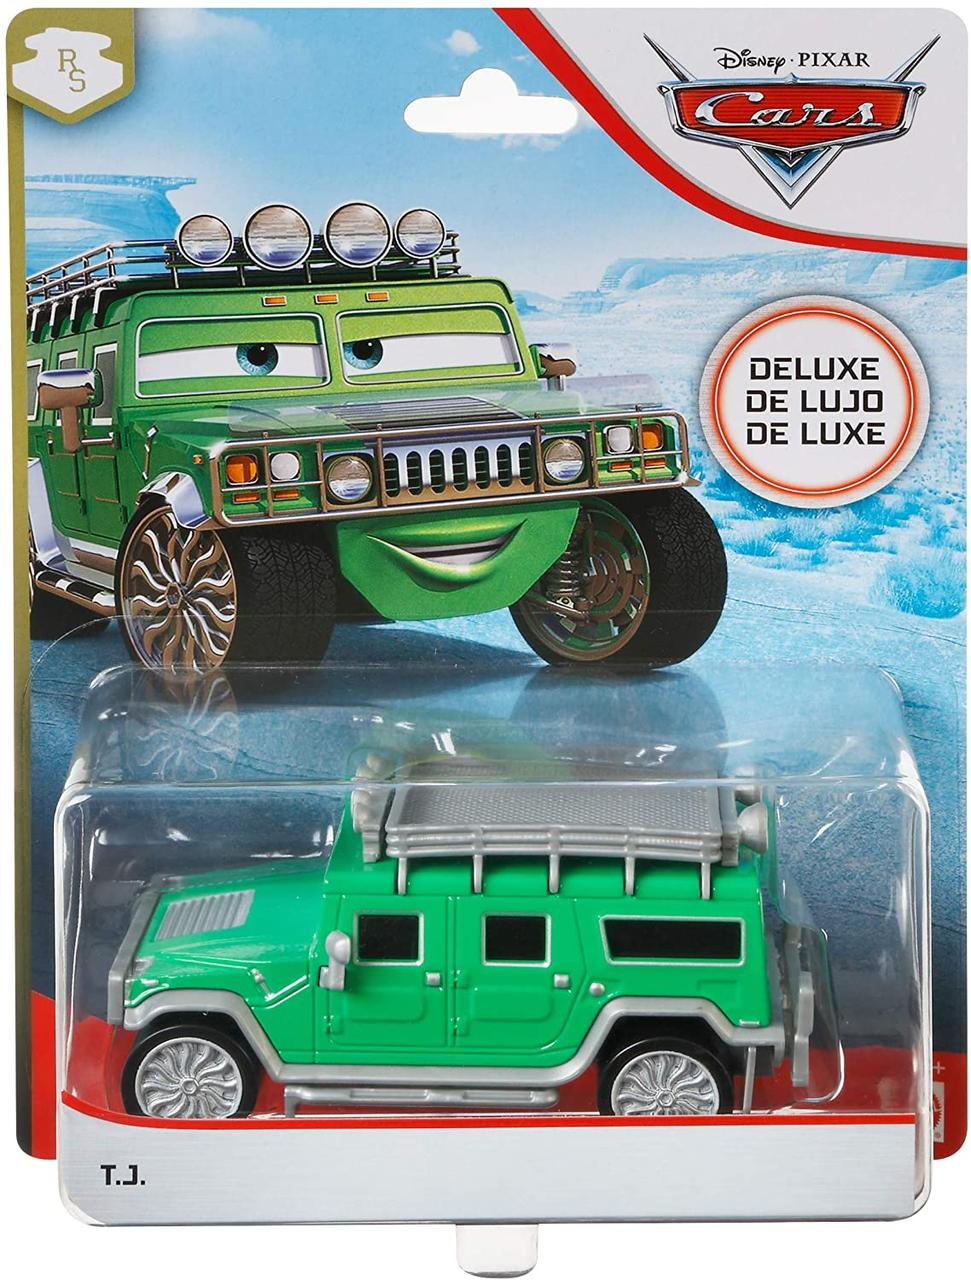 Тачки: Хаммер Ти Джей (T.J.) Disney Pixar Cars Deluxe  от Mattel